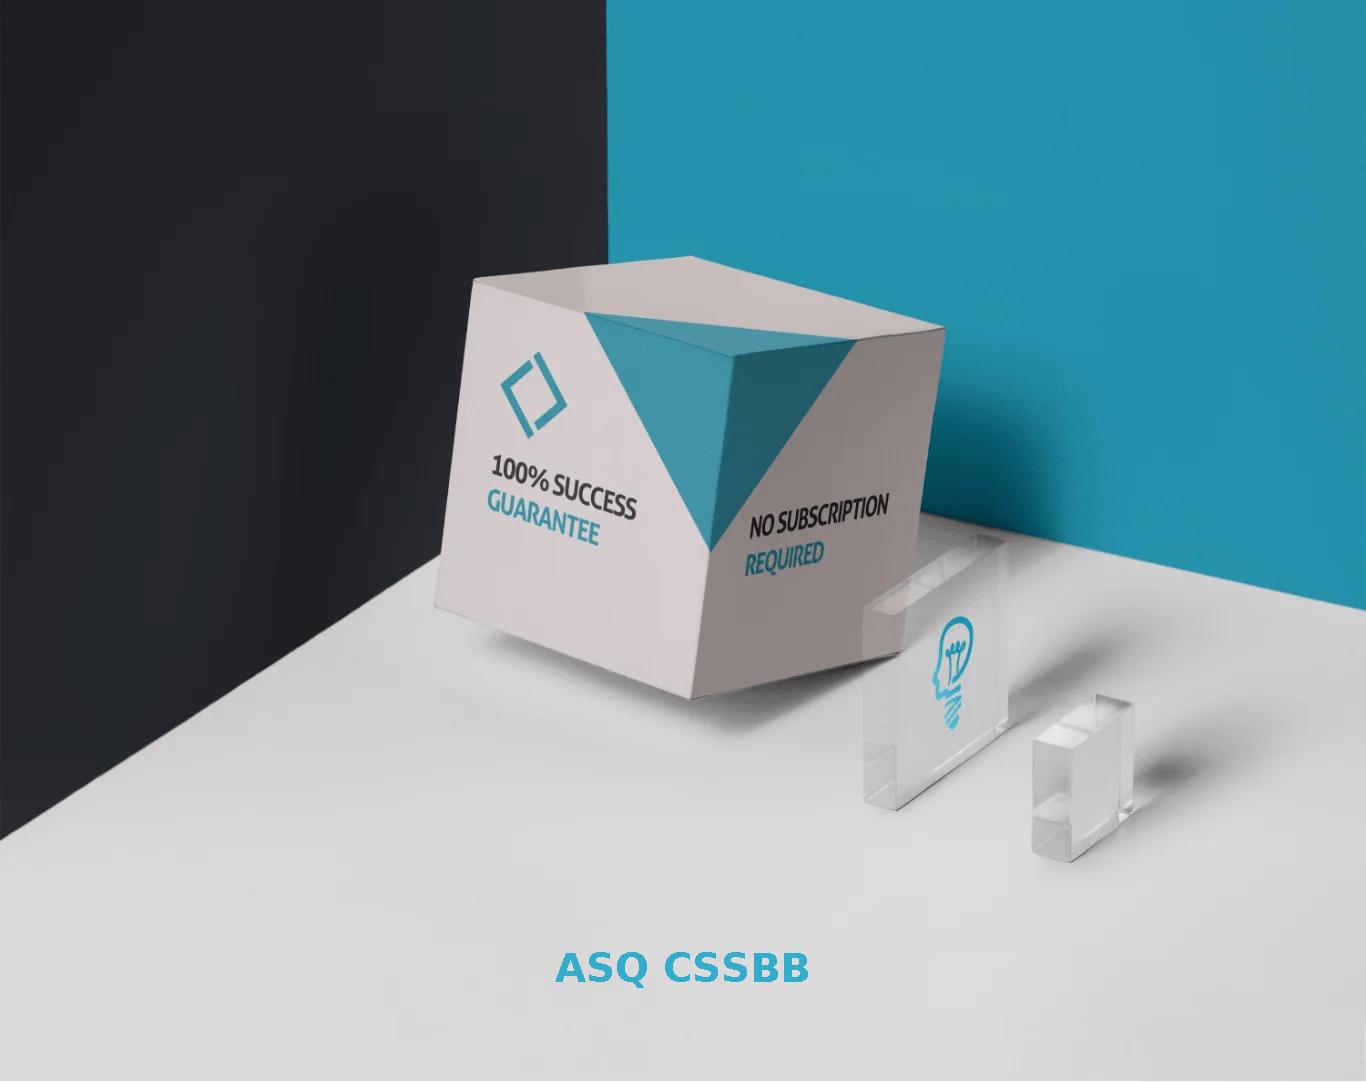 ASQ CSSBB Exams